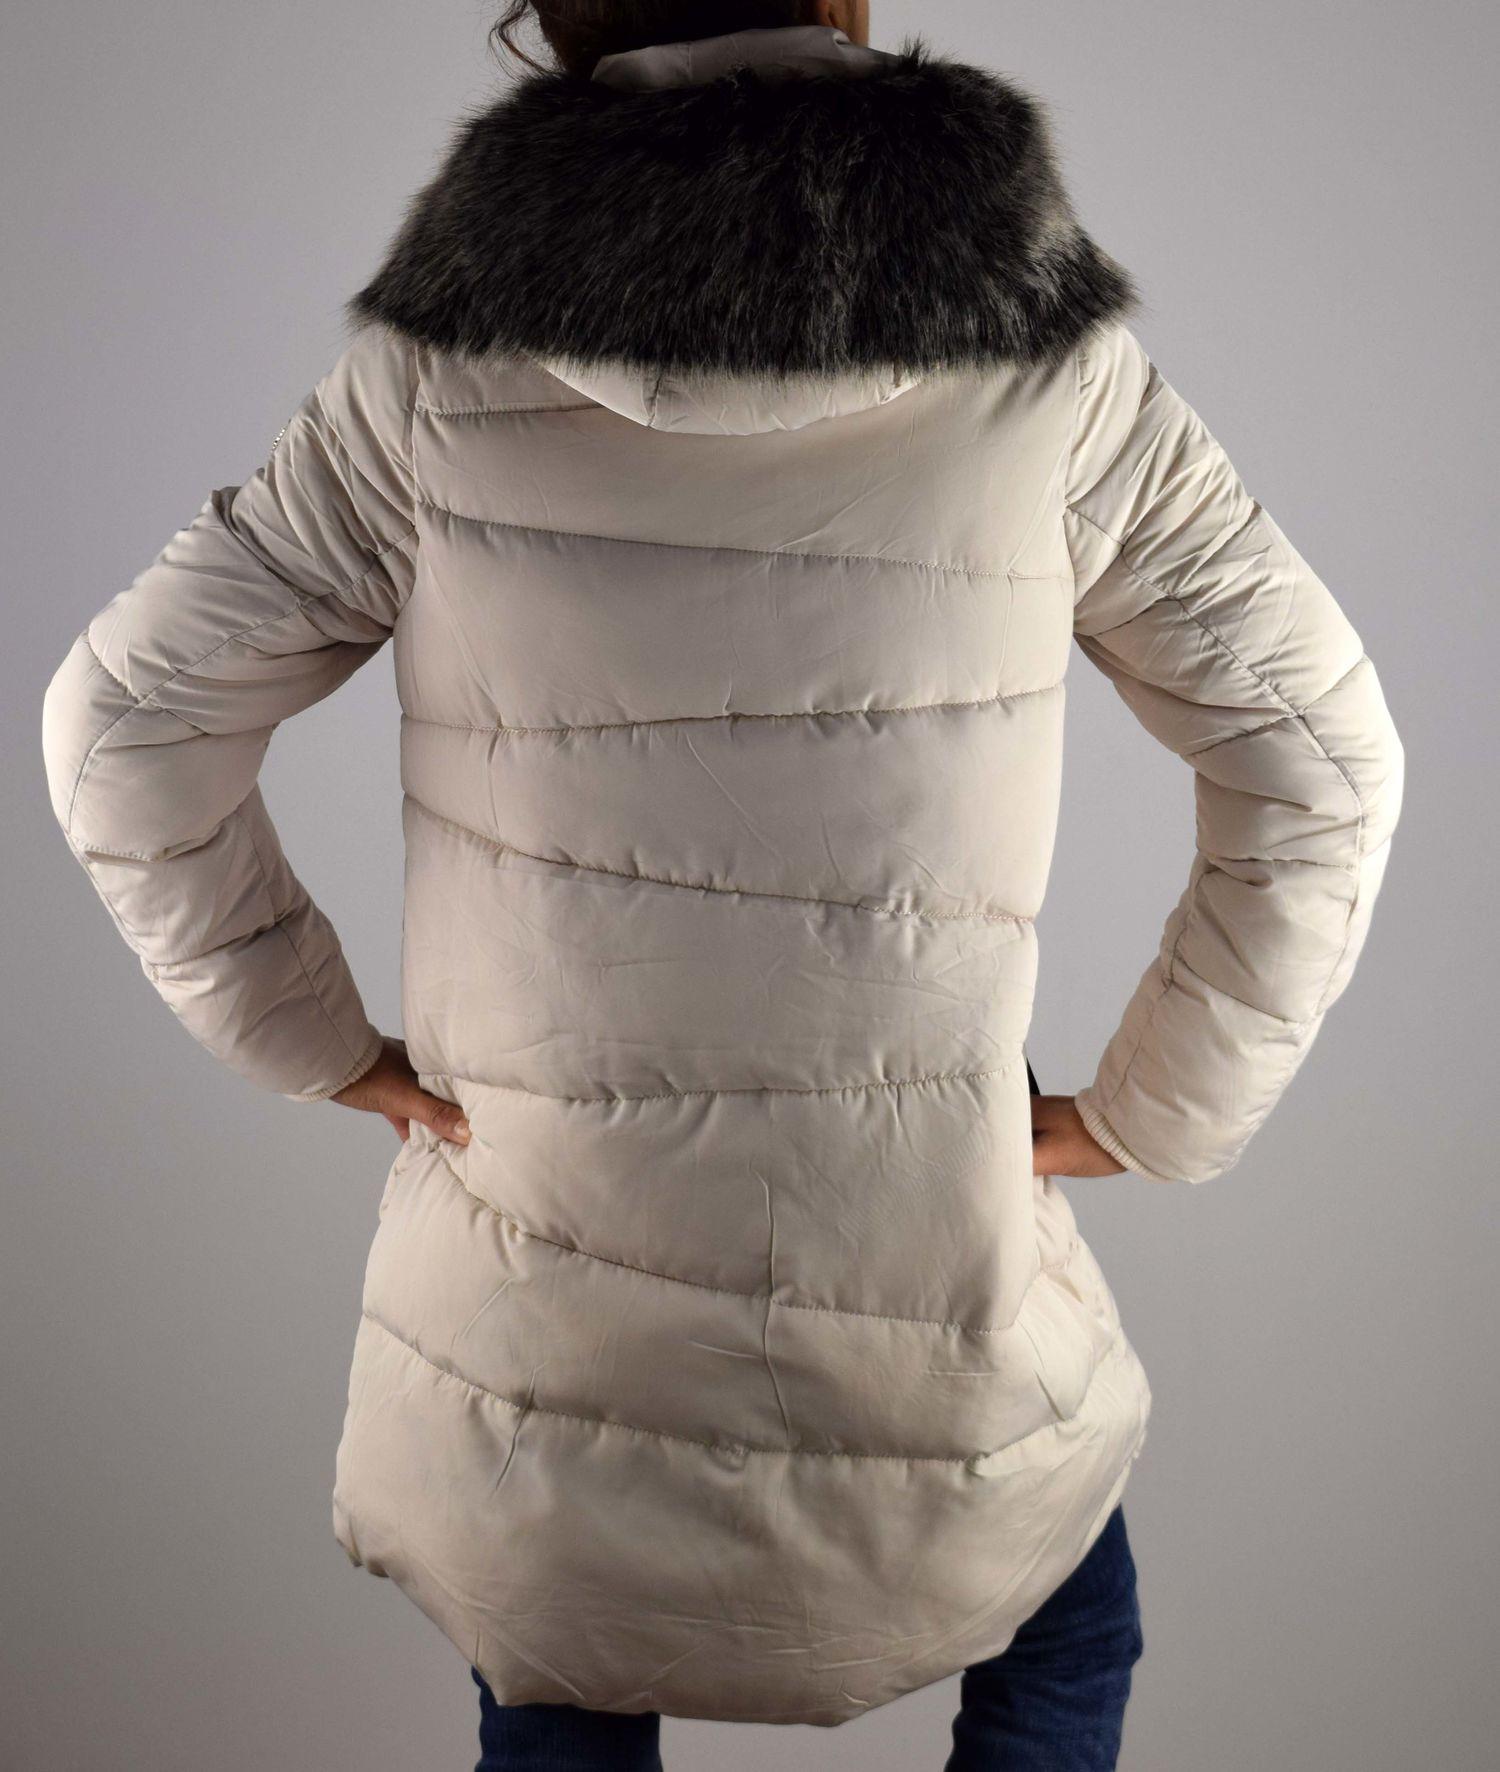 57fc6a853f7 пухени зимни дамски якета топли зимни дамски якета дълги зимни дамски якета  ...